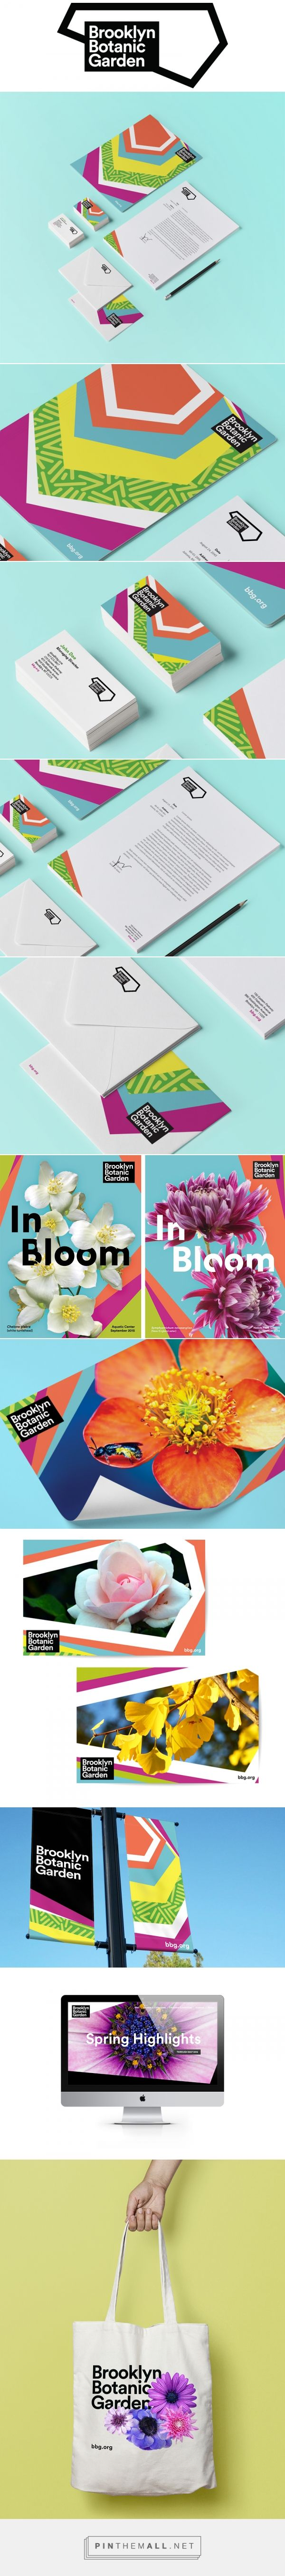 Inspiración para diseñar tu marca personal. Brooklyn Botanic Garden on Behance | Fivestar Branding – Design and Branding Agency & Inspiration Gallery http://jrstudioweb.com/diseno-grafico/diseno-de-logotipos/